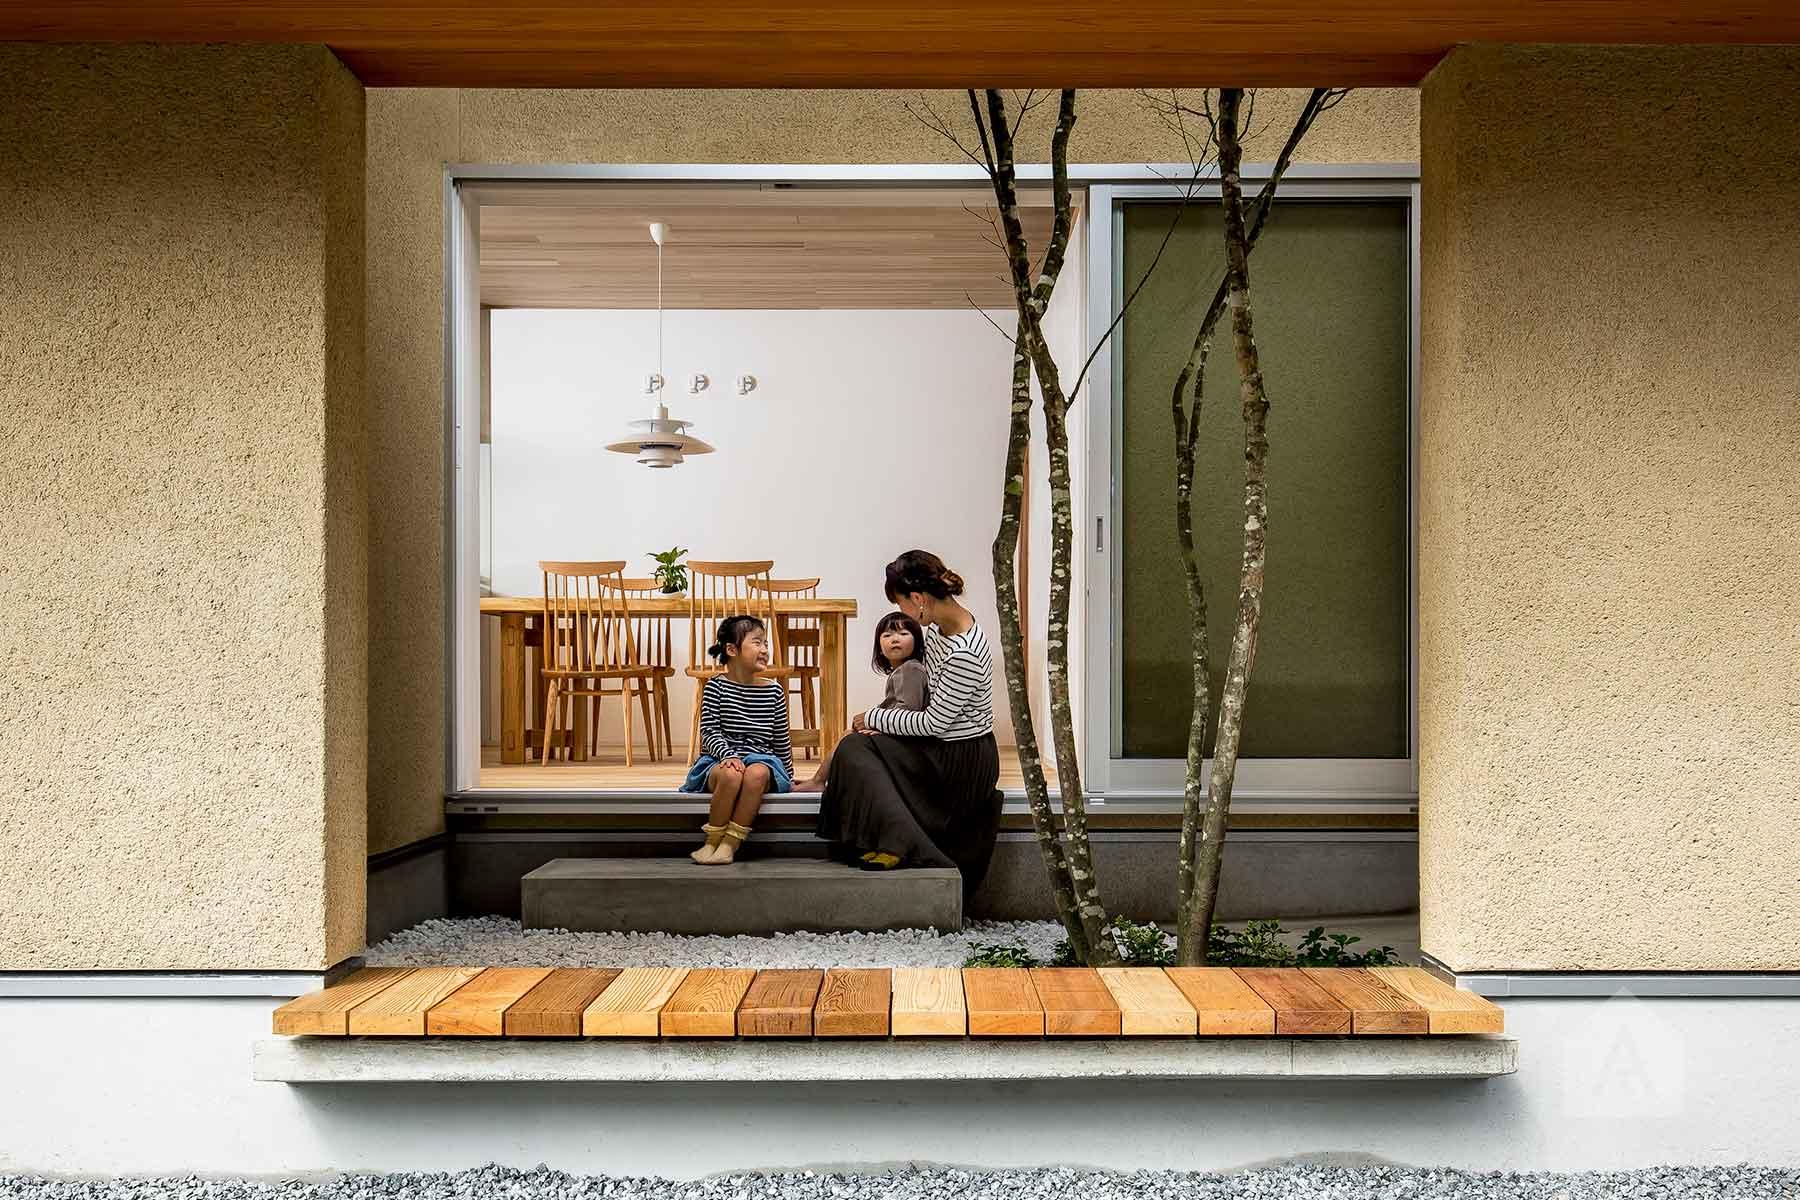 Architecture by Hearth Architects, Japan. Photography by Yuta Yamada